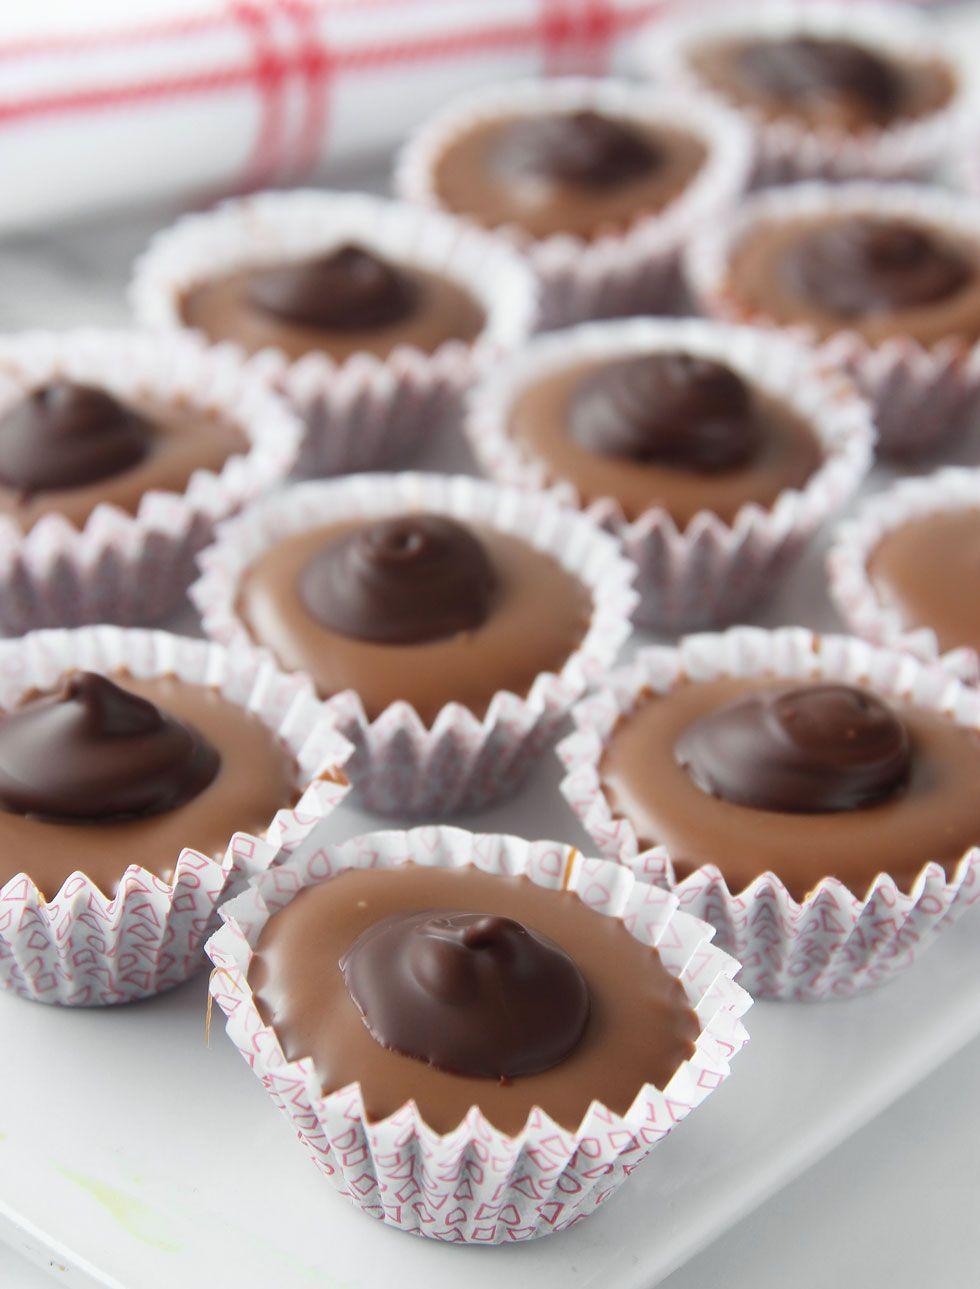 julgodis utan choklad